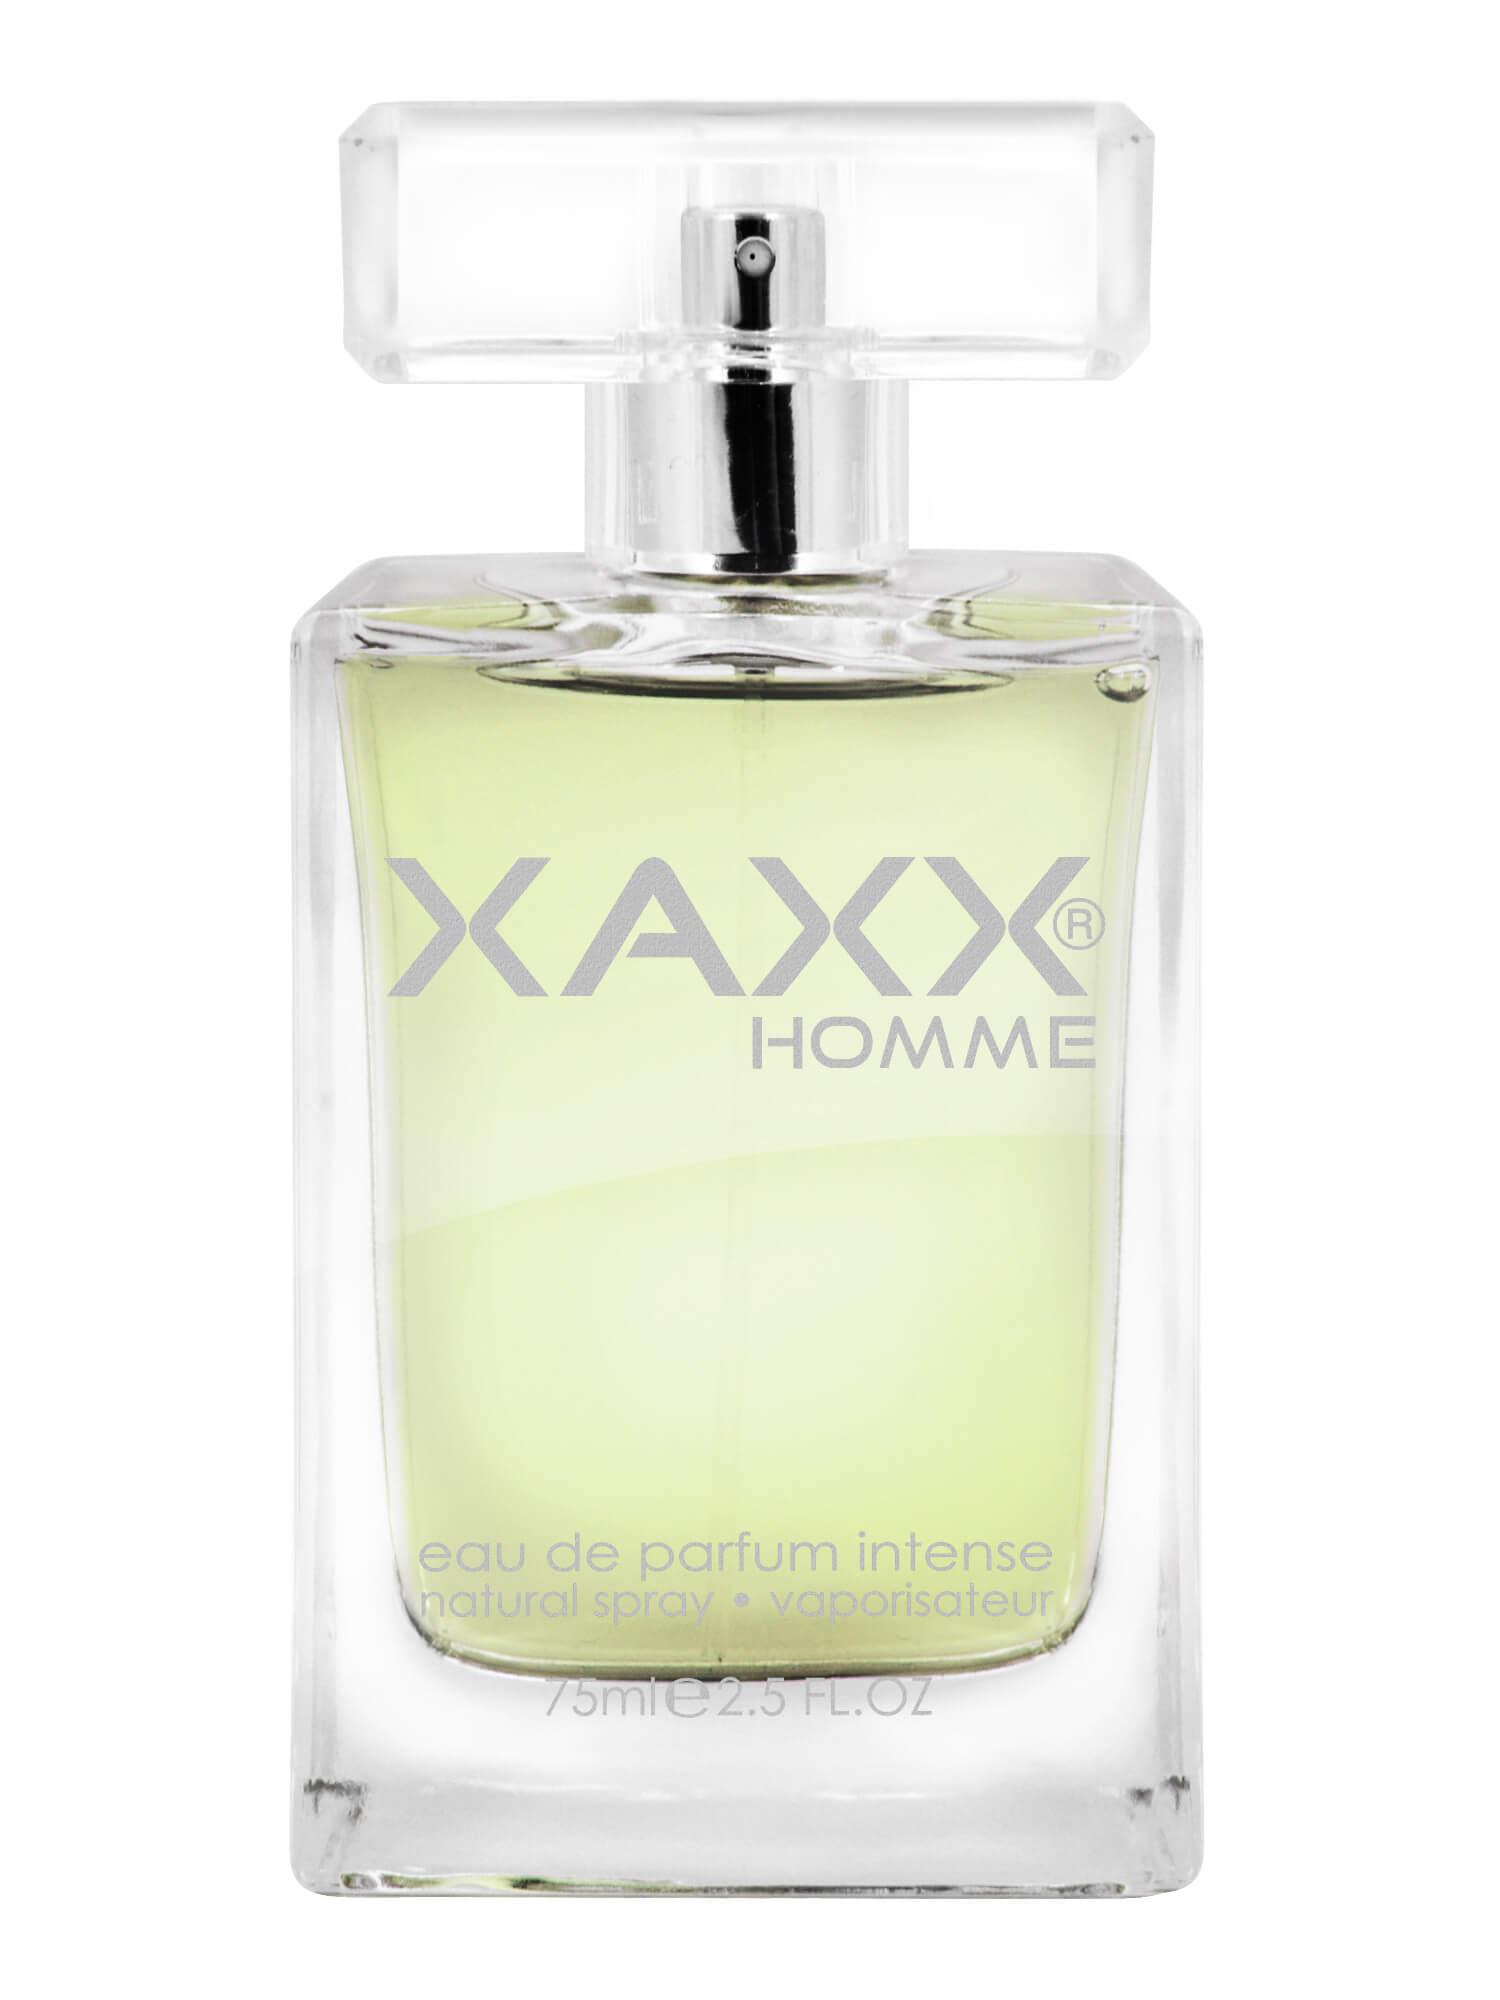 XAXX Herrenduft FIVE intense 75ml